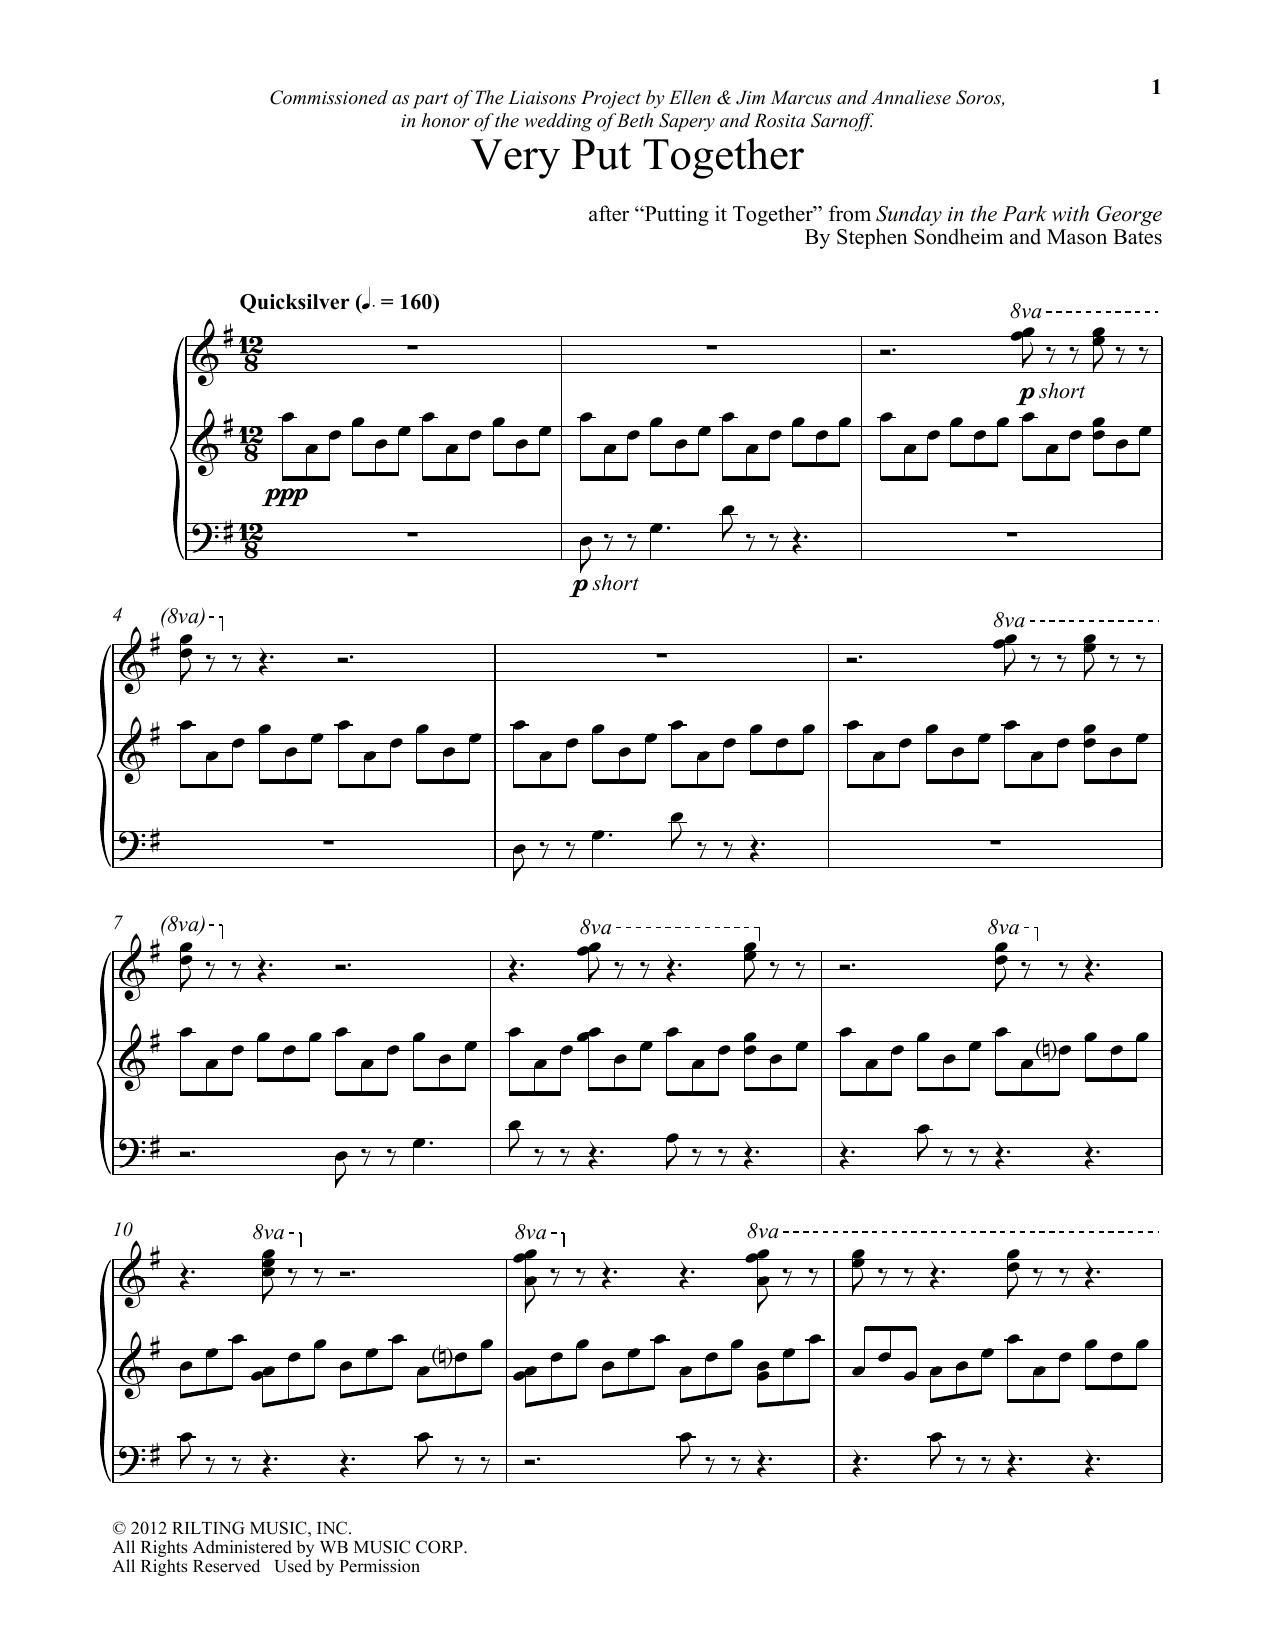 Stephen Sondheim Very Put Together (arr. Mason Bates) sheet music notes and chords. Download Printable PDF.